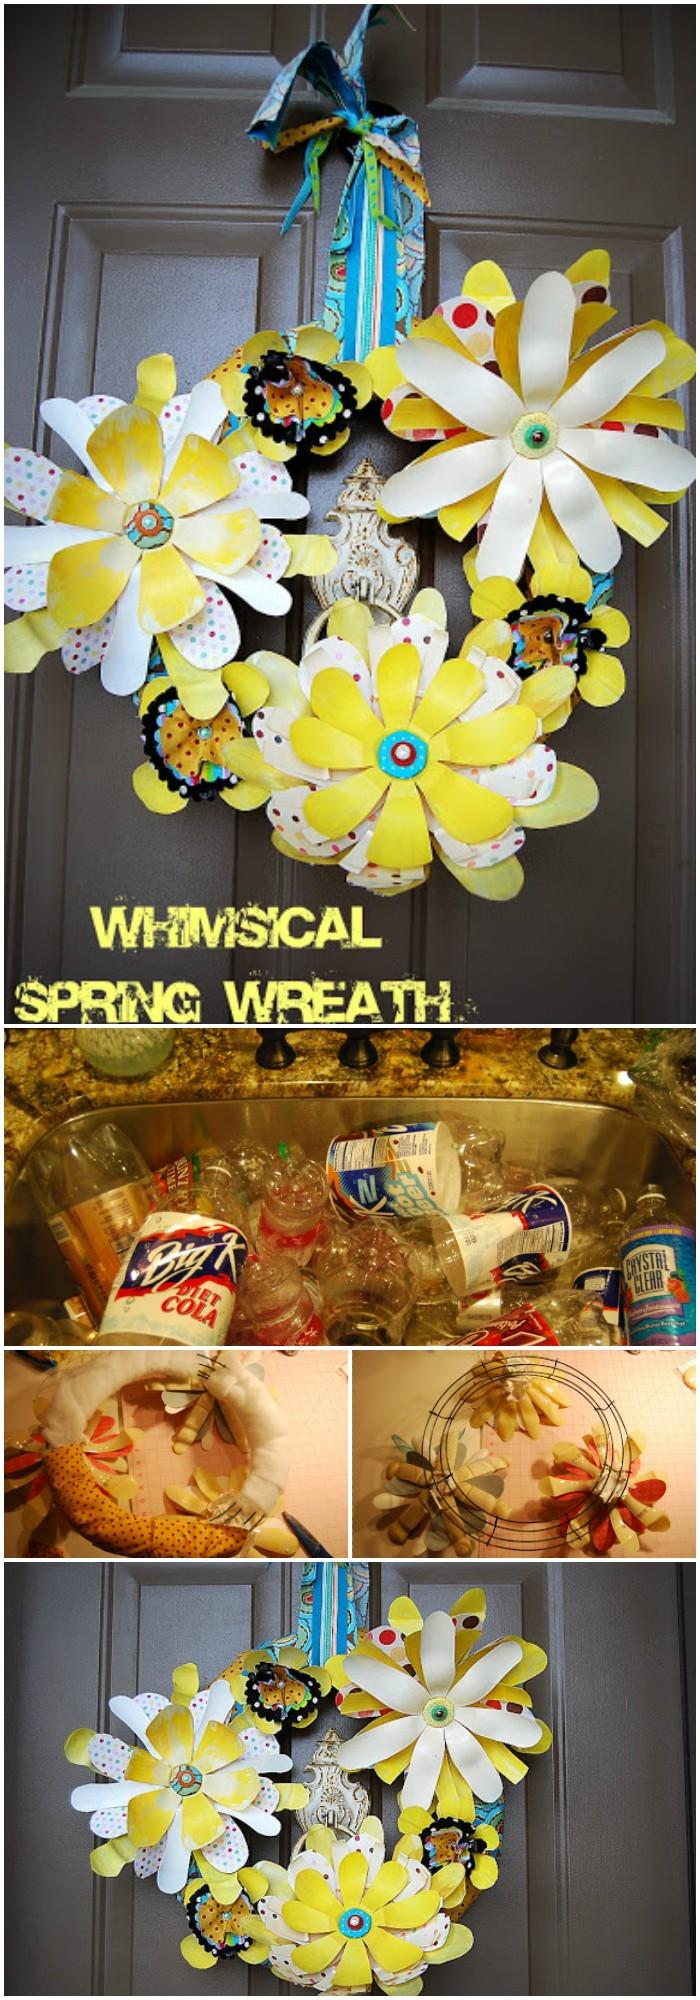 Creative DIY ways to reuse plastic bottles Whimsical Spring wreaths